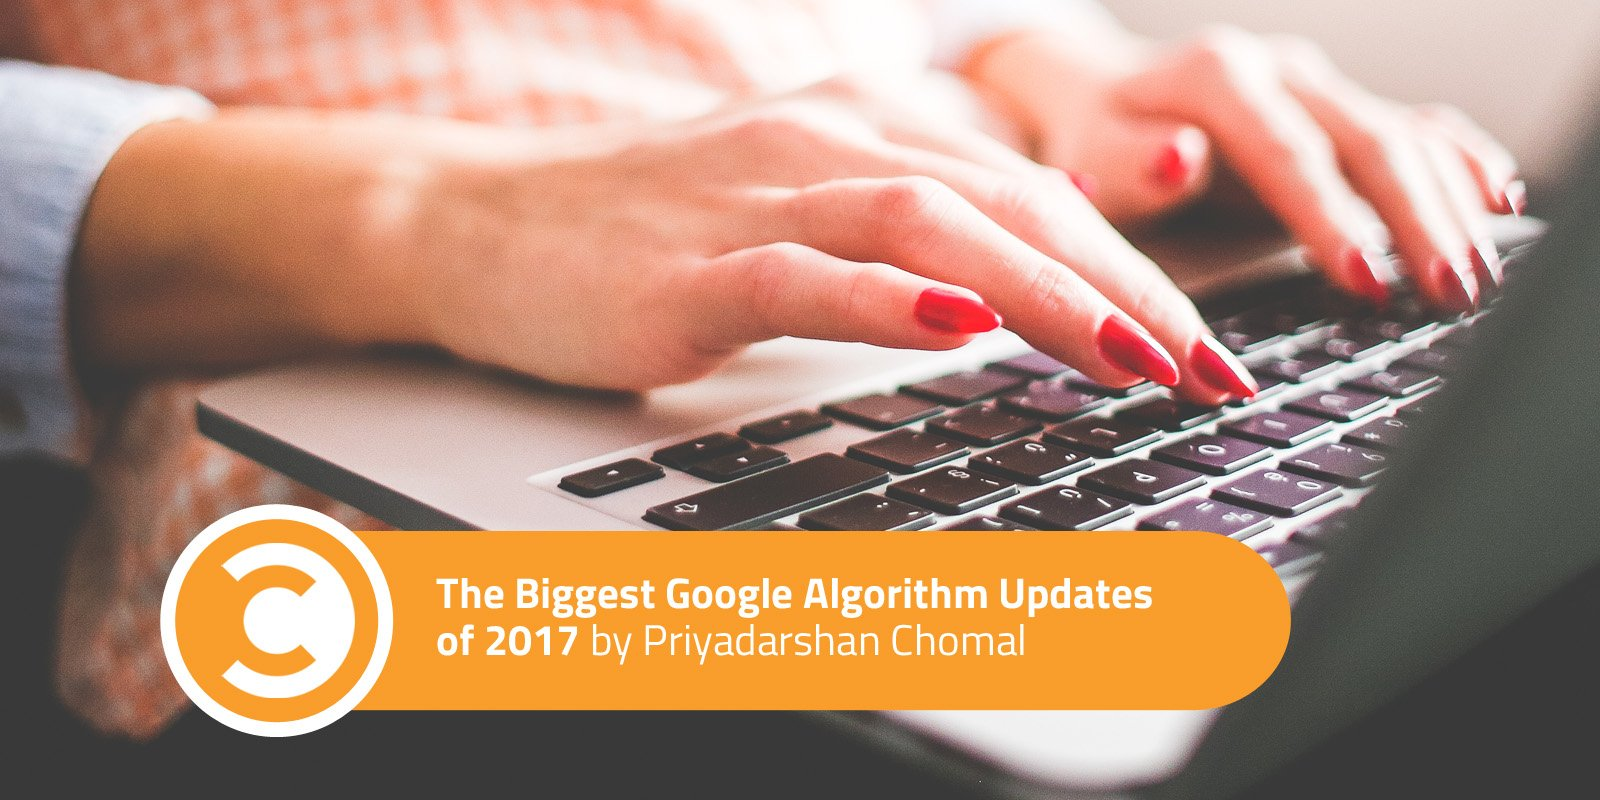 The Biggest Google Algorithm Updates of 2017